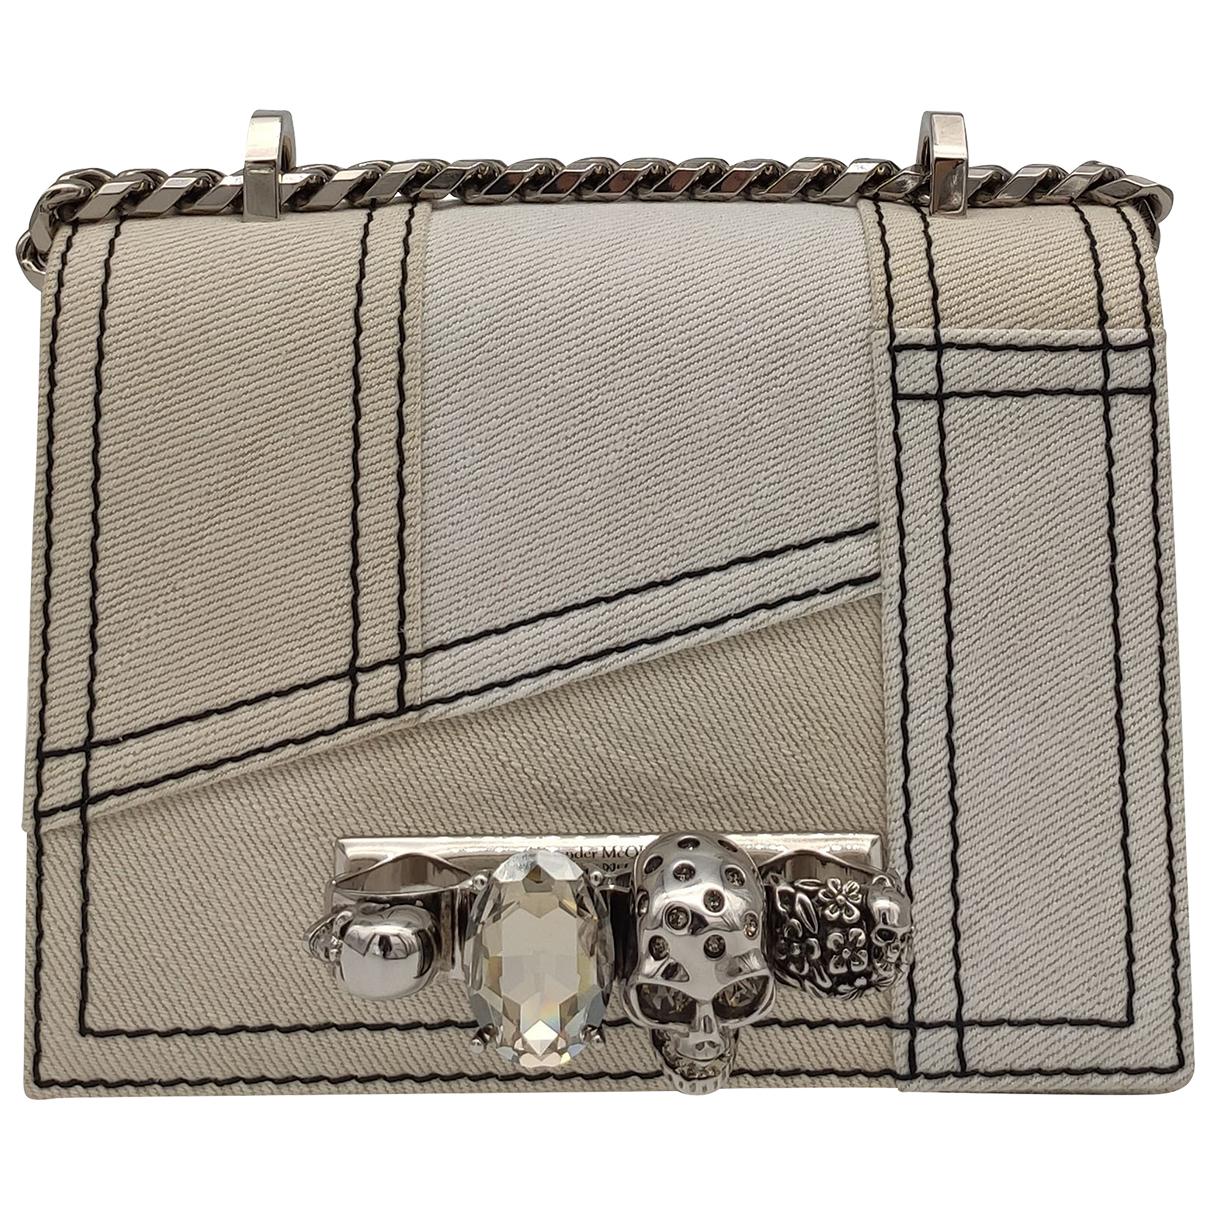 Alexander Mcqueen \N Handtasche in  Weiss Baumwolle